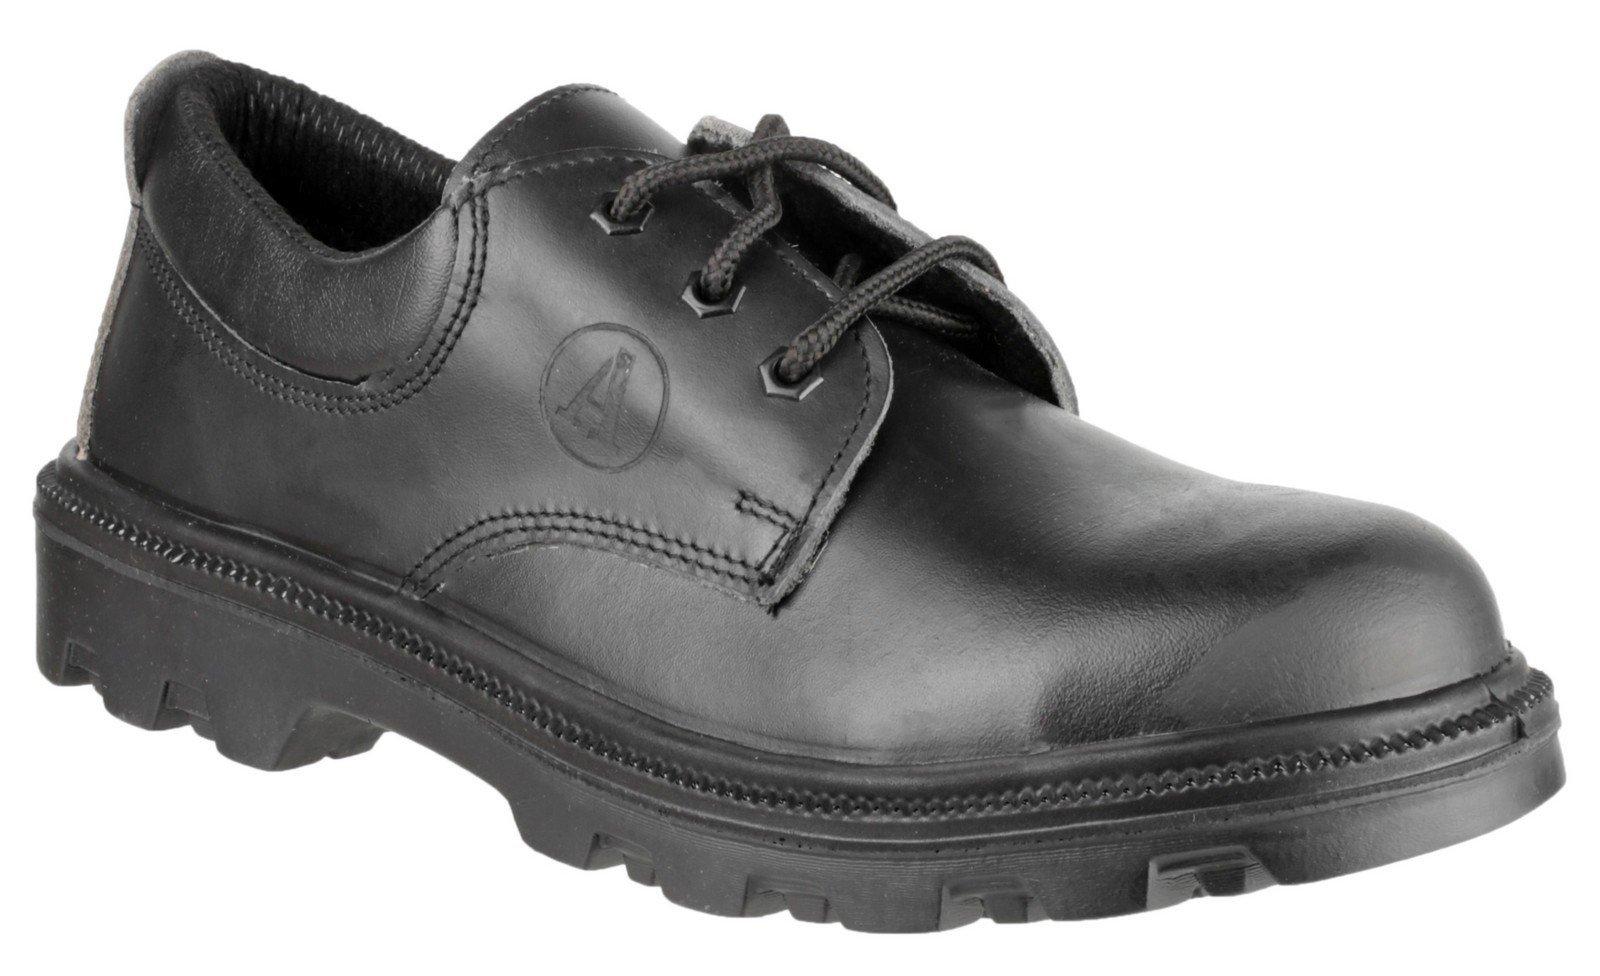 Amblers Unisex Safety Lace up Shoe Black 08155 - Black 6